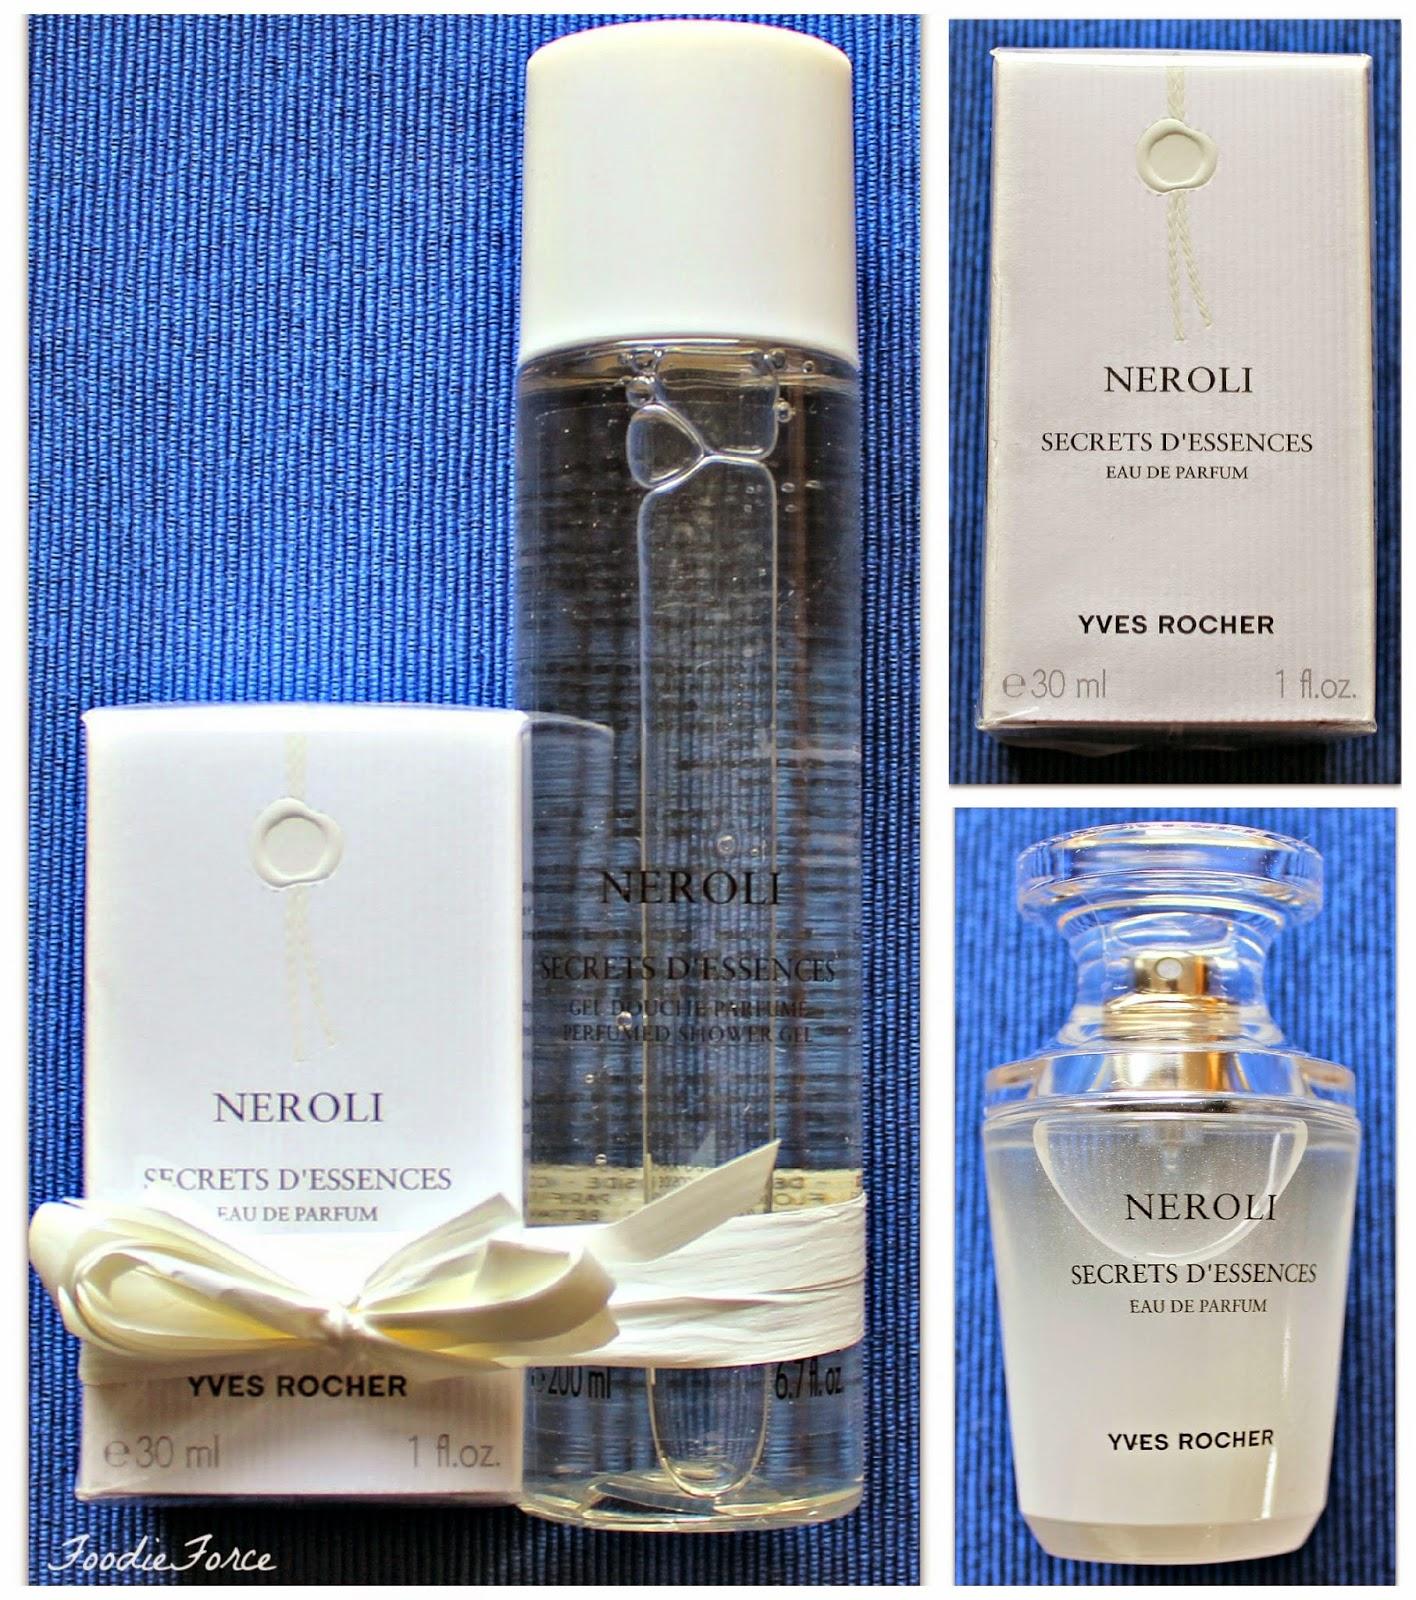 Yves Rocher perfume